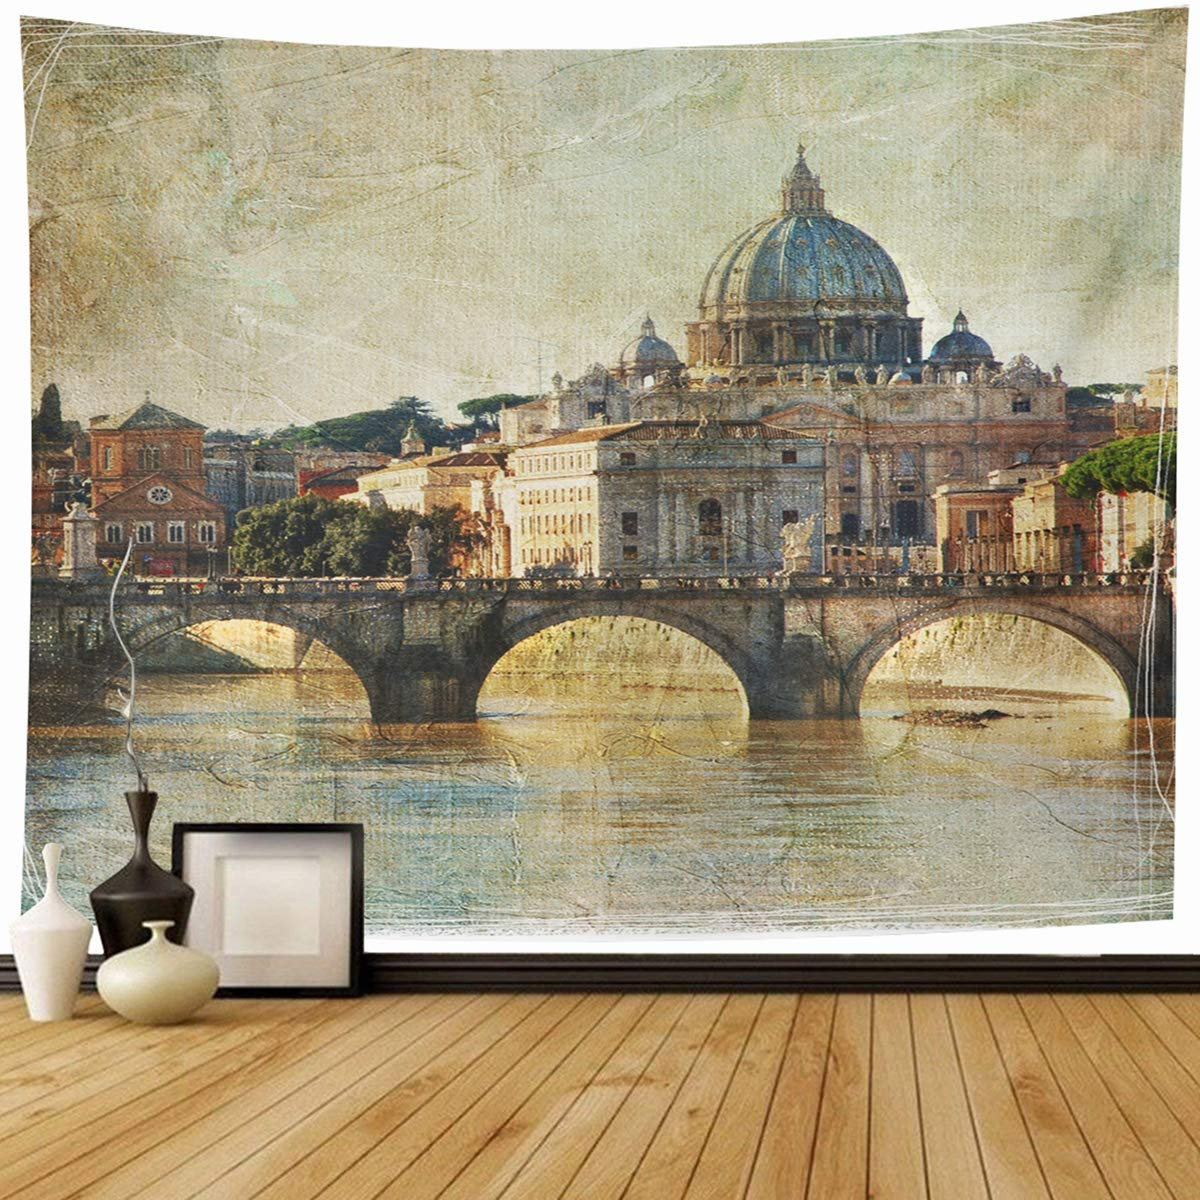 "Ahawoso Tapestry Wall Hanging 80""x60"" Jesus Italian San Pietro Basilica Rome Retro Styled Attraction Vintage Travel Holiday Italy Cityscape Home Decor Tapestries Decorative Bedroom Living Room Dorm"